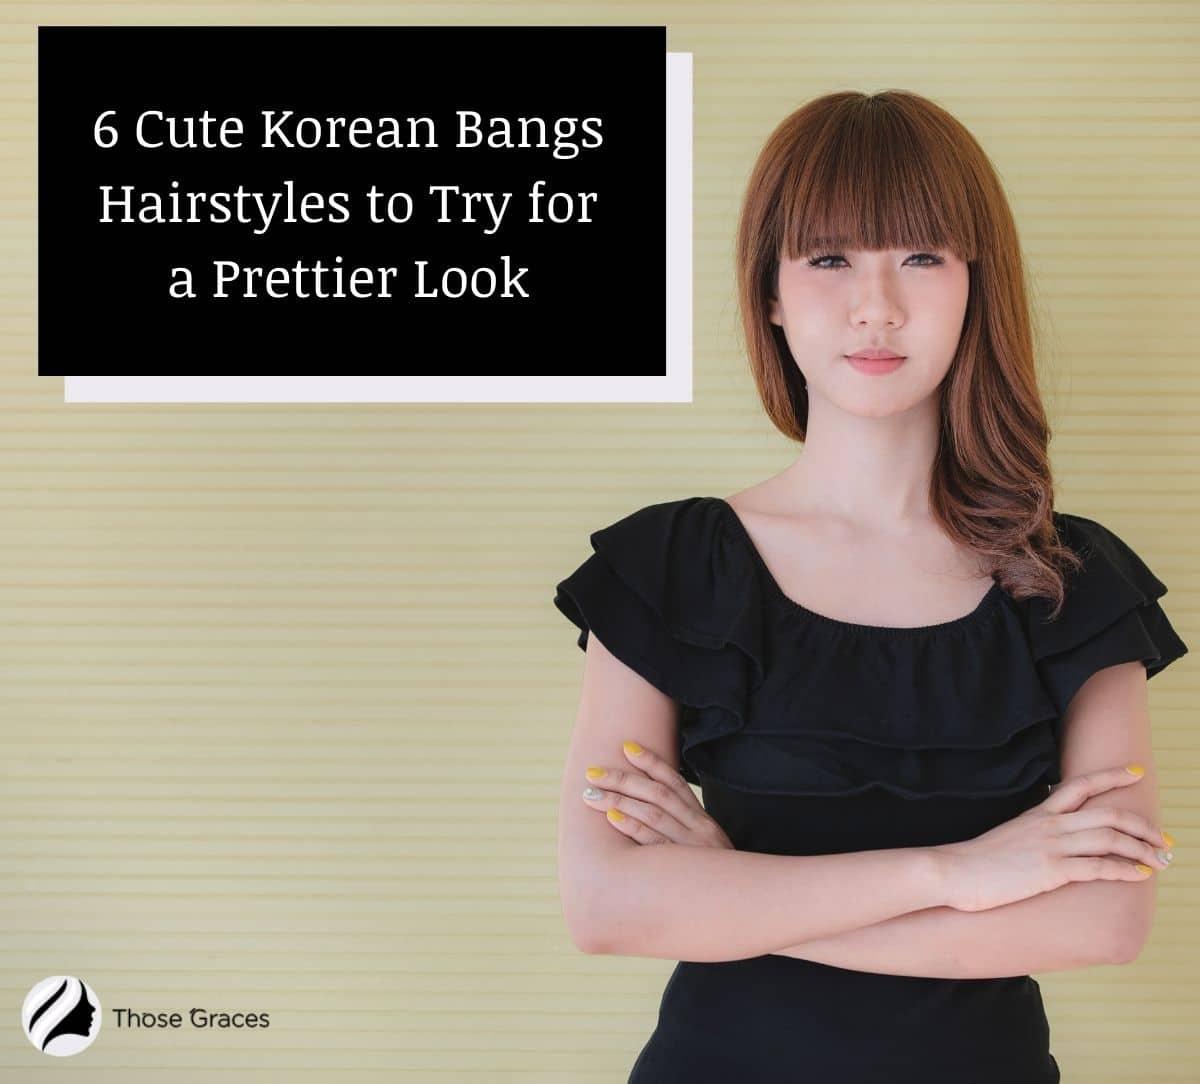 a Korean lady with a blunt Korean bangs wearing a black dress